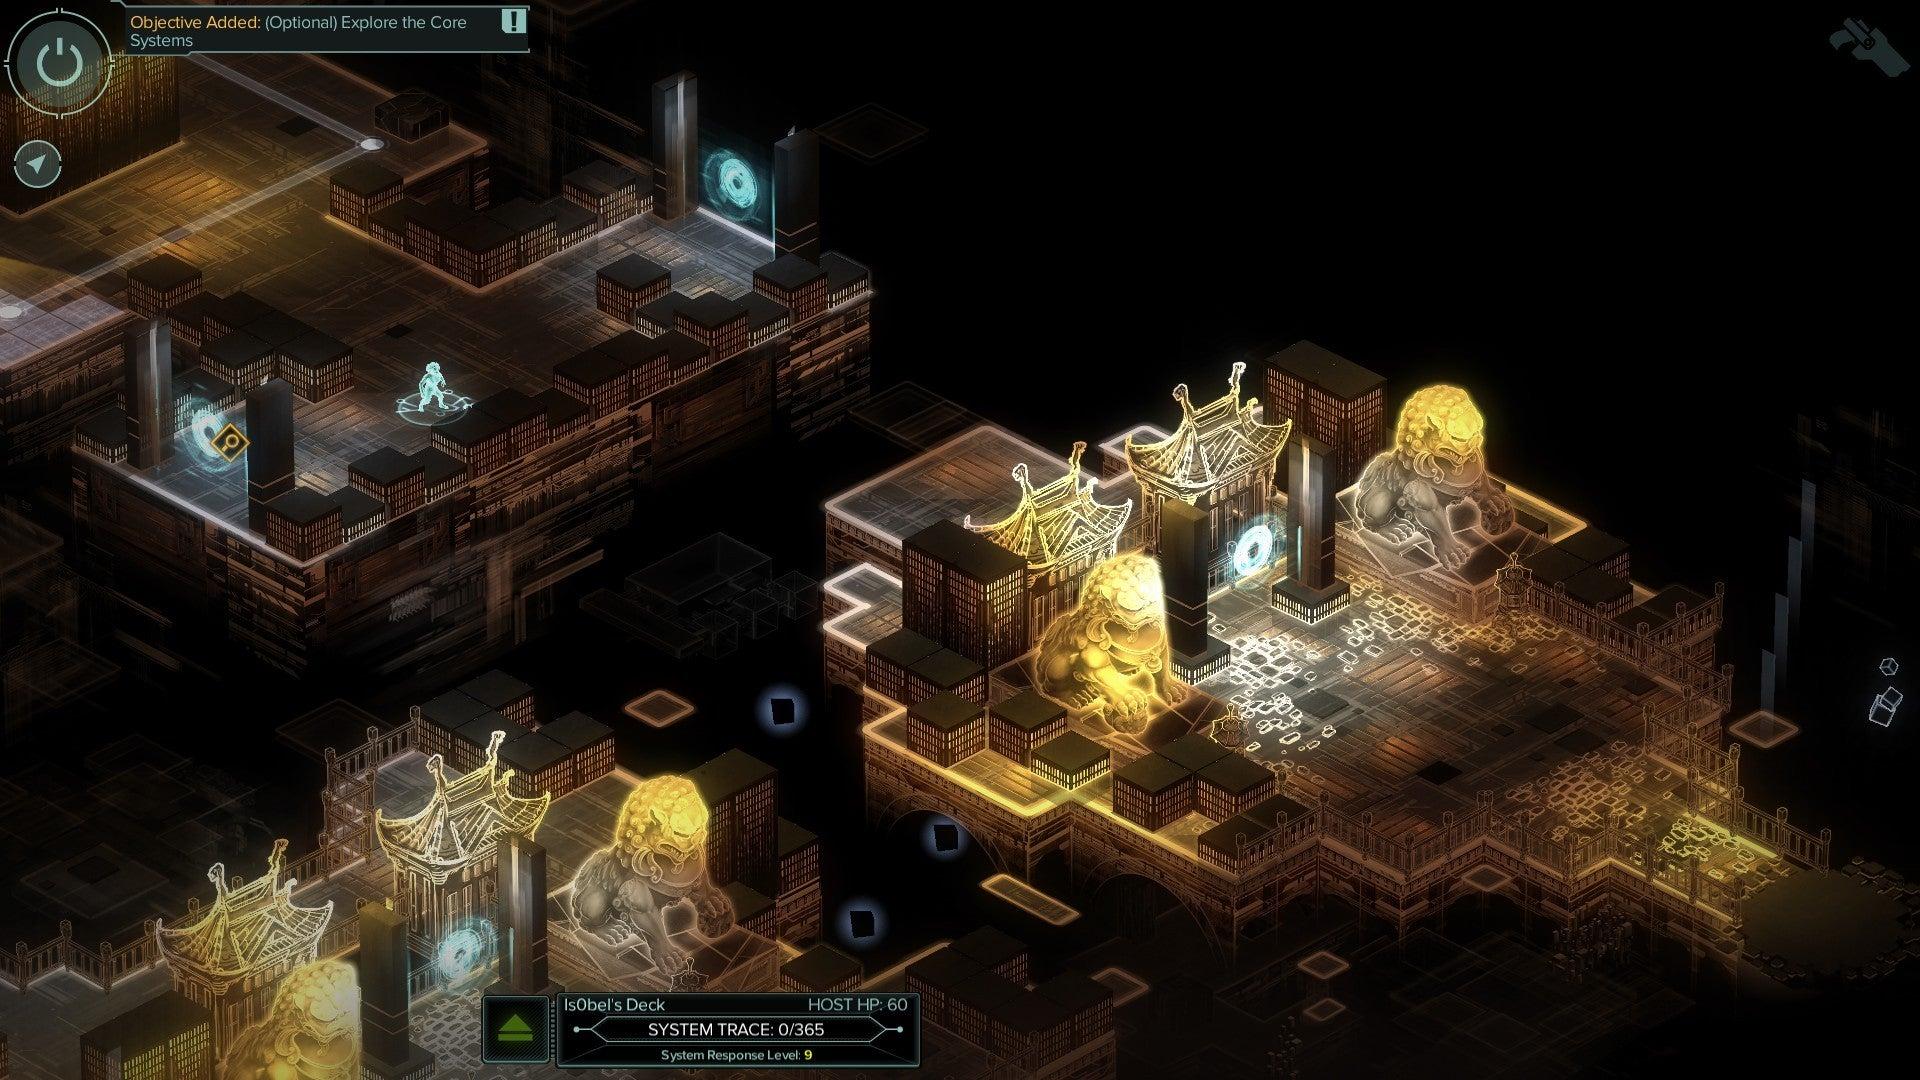 shadowrun hong kong multiplayer